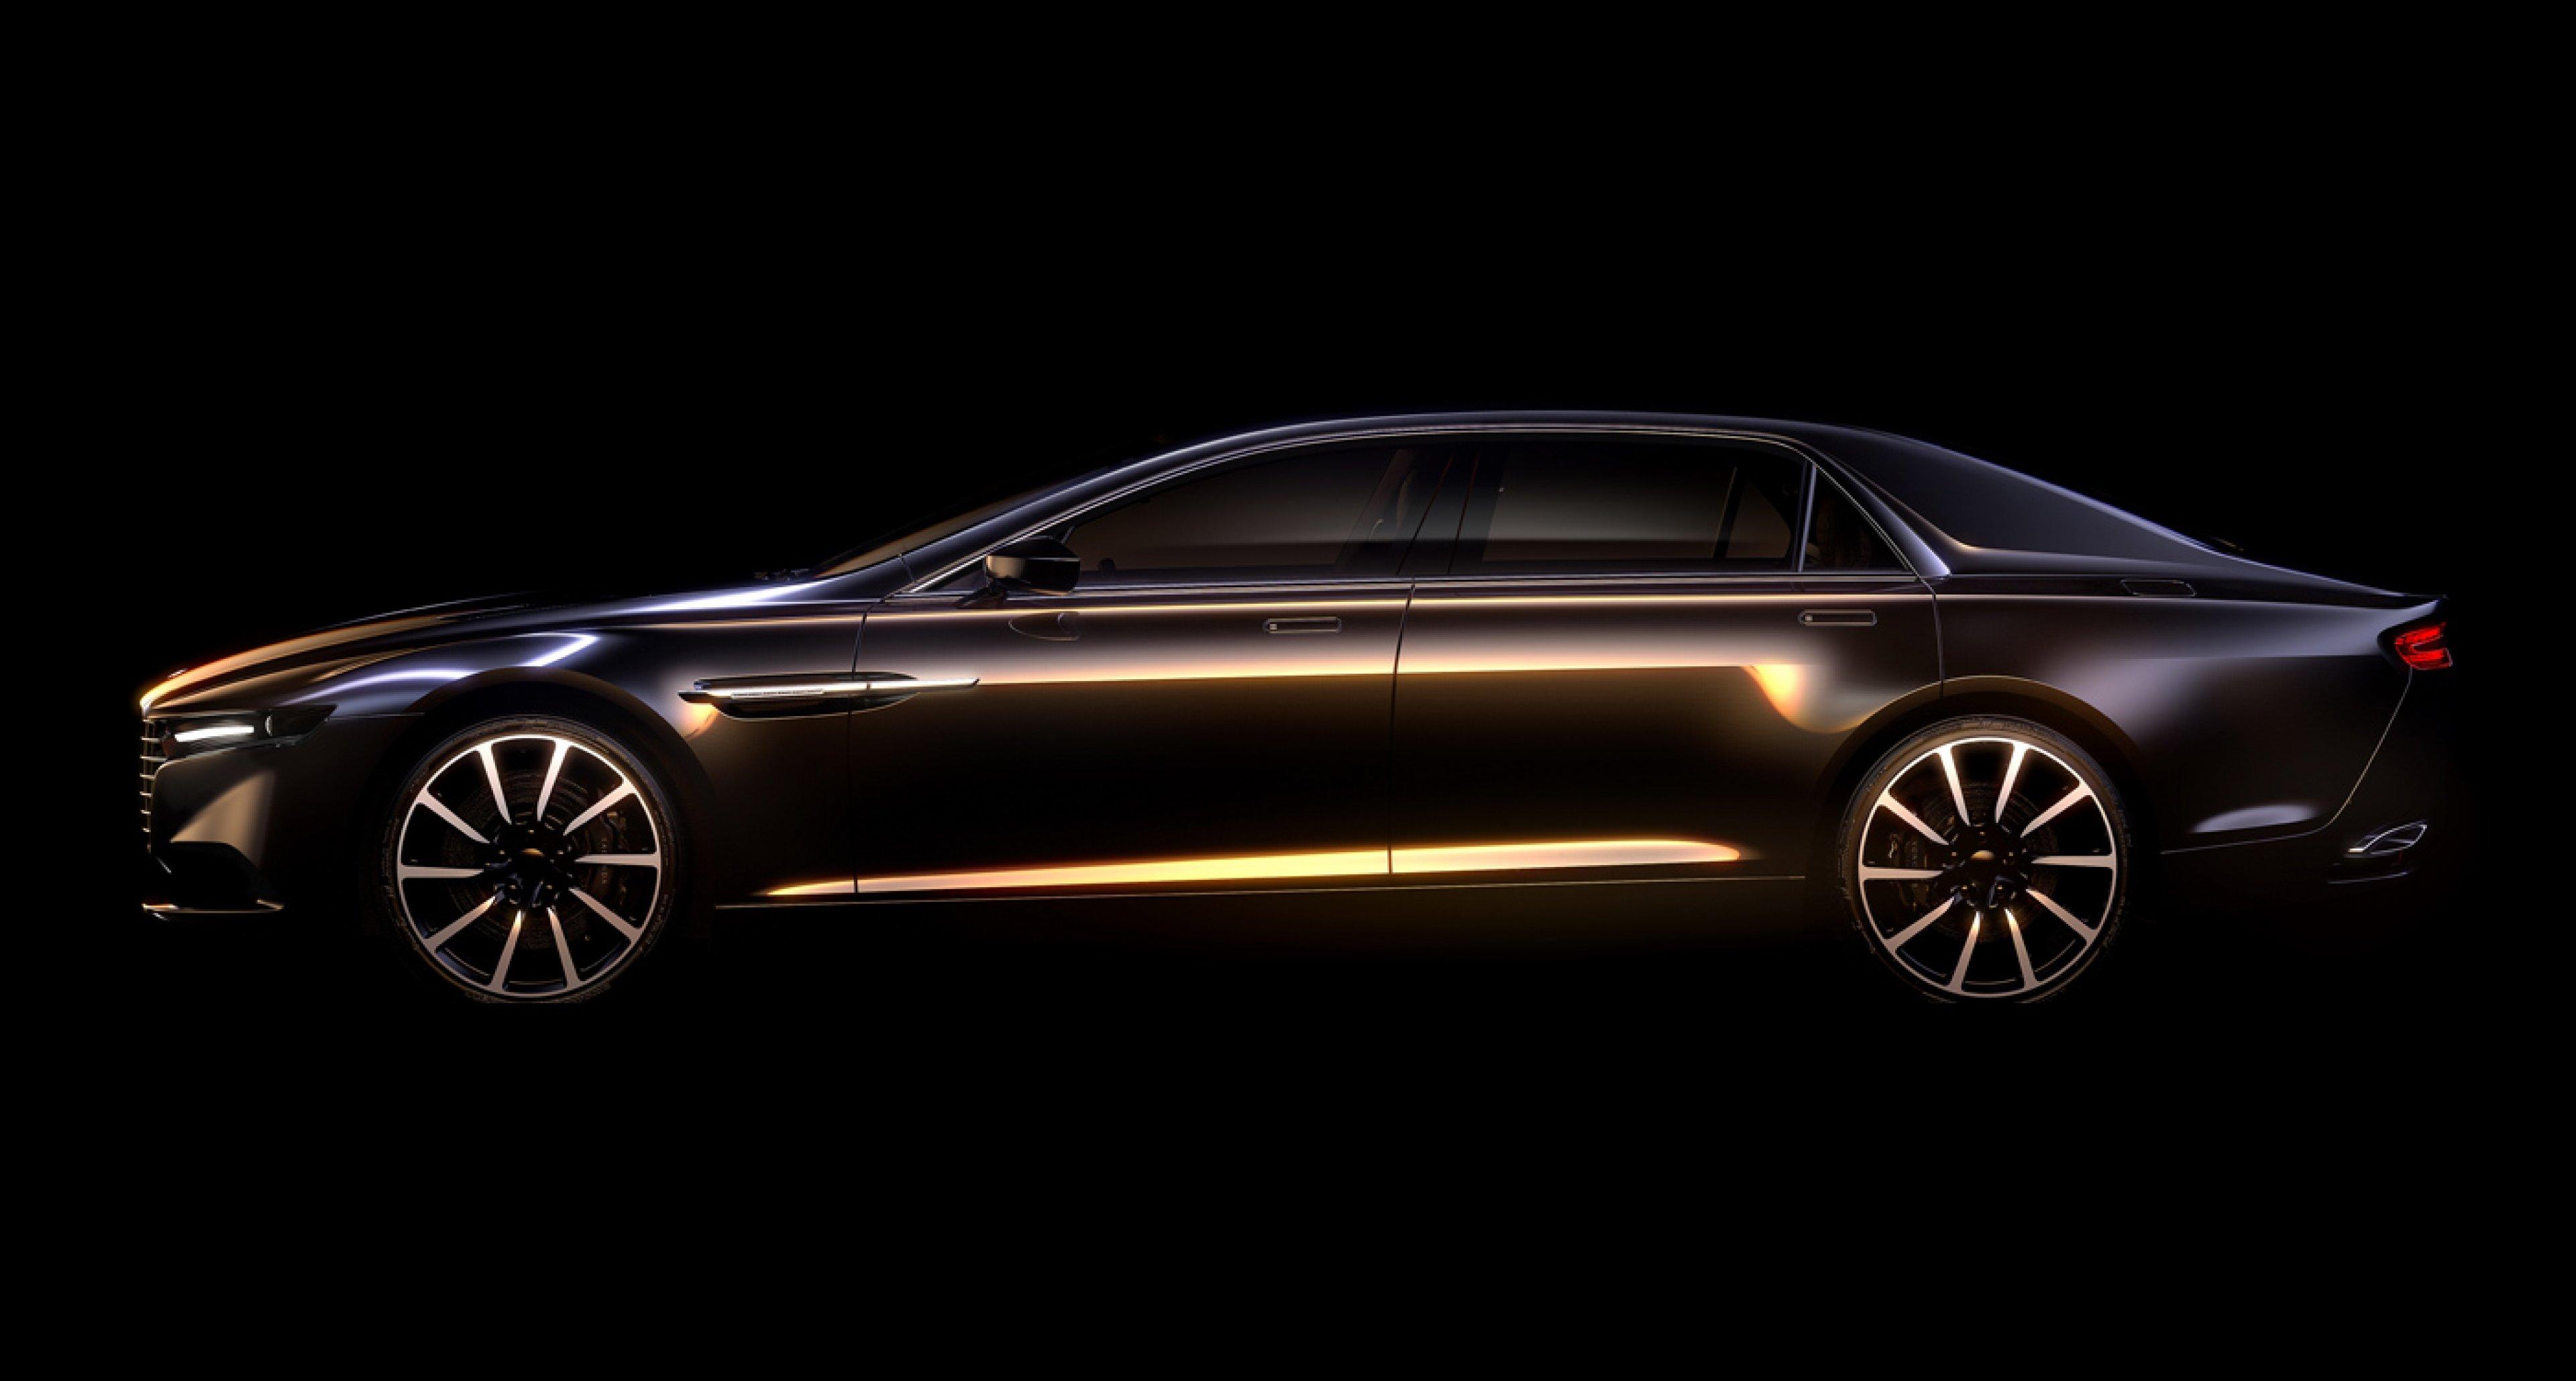 2015 Aston Martin Lagonda bespoke super saloon